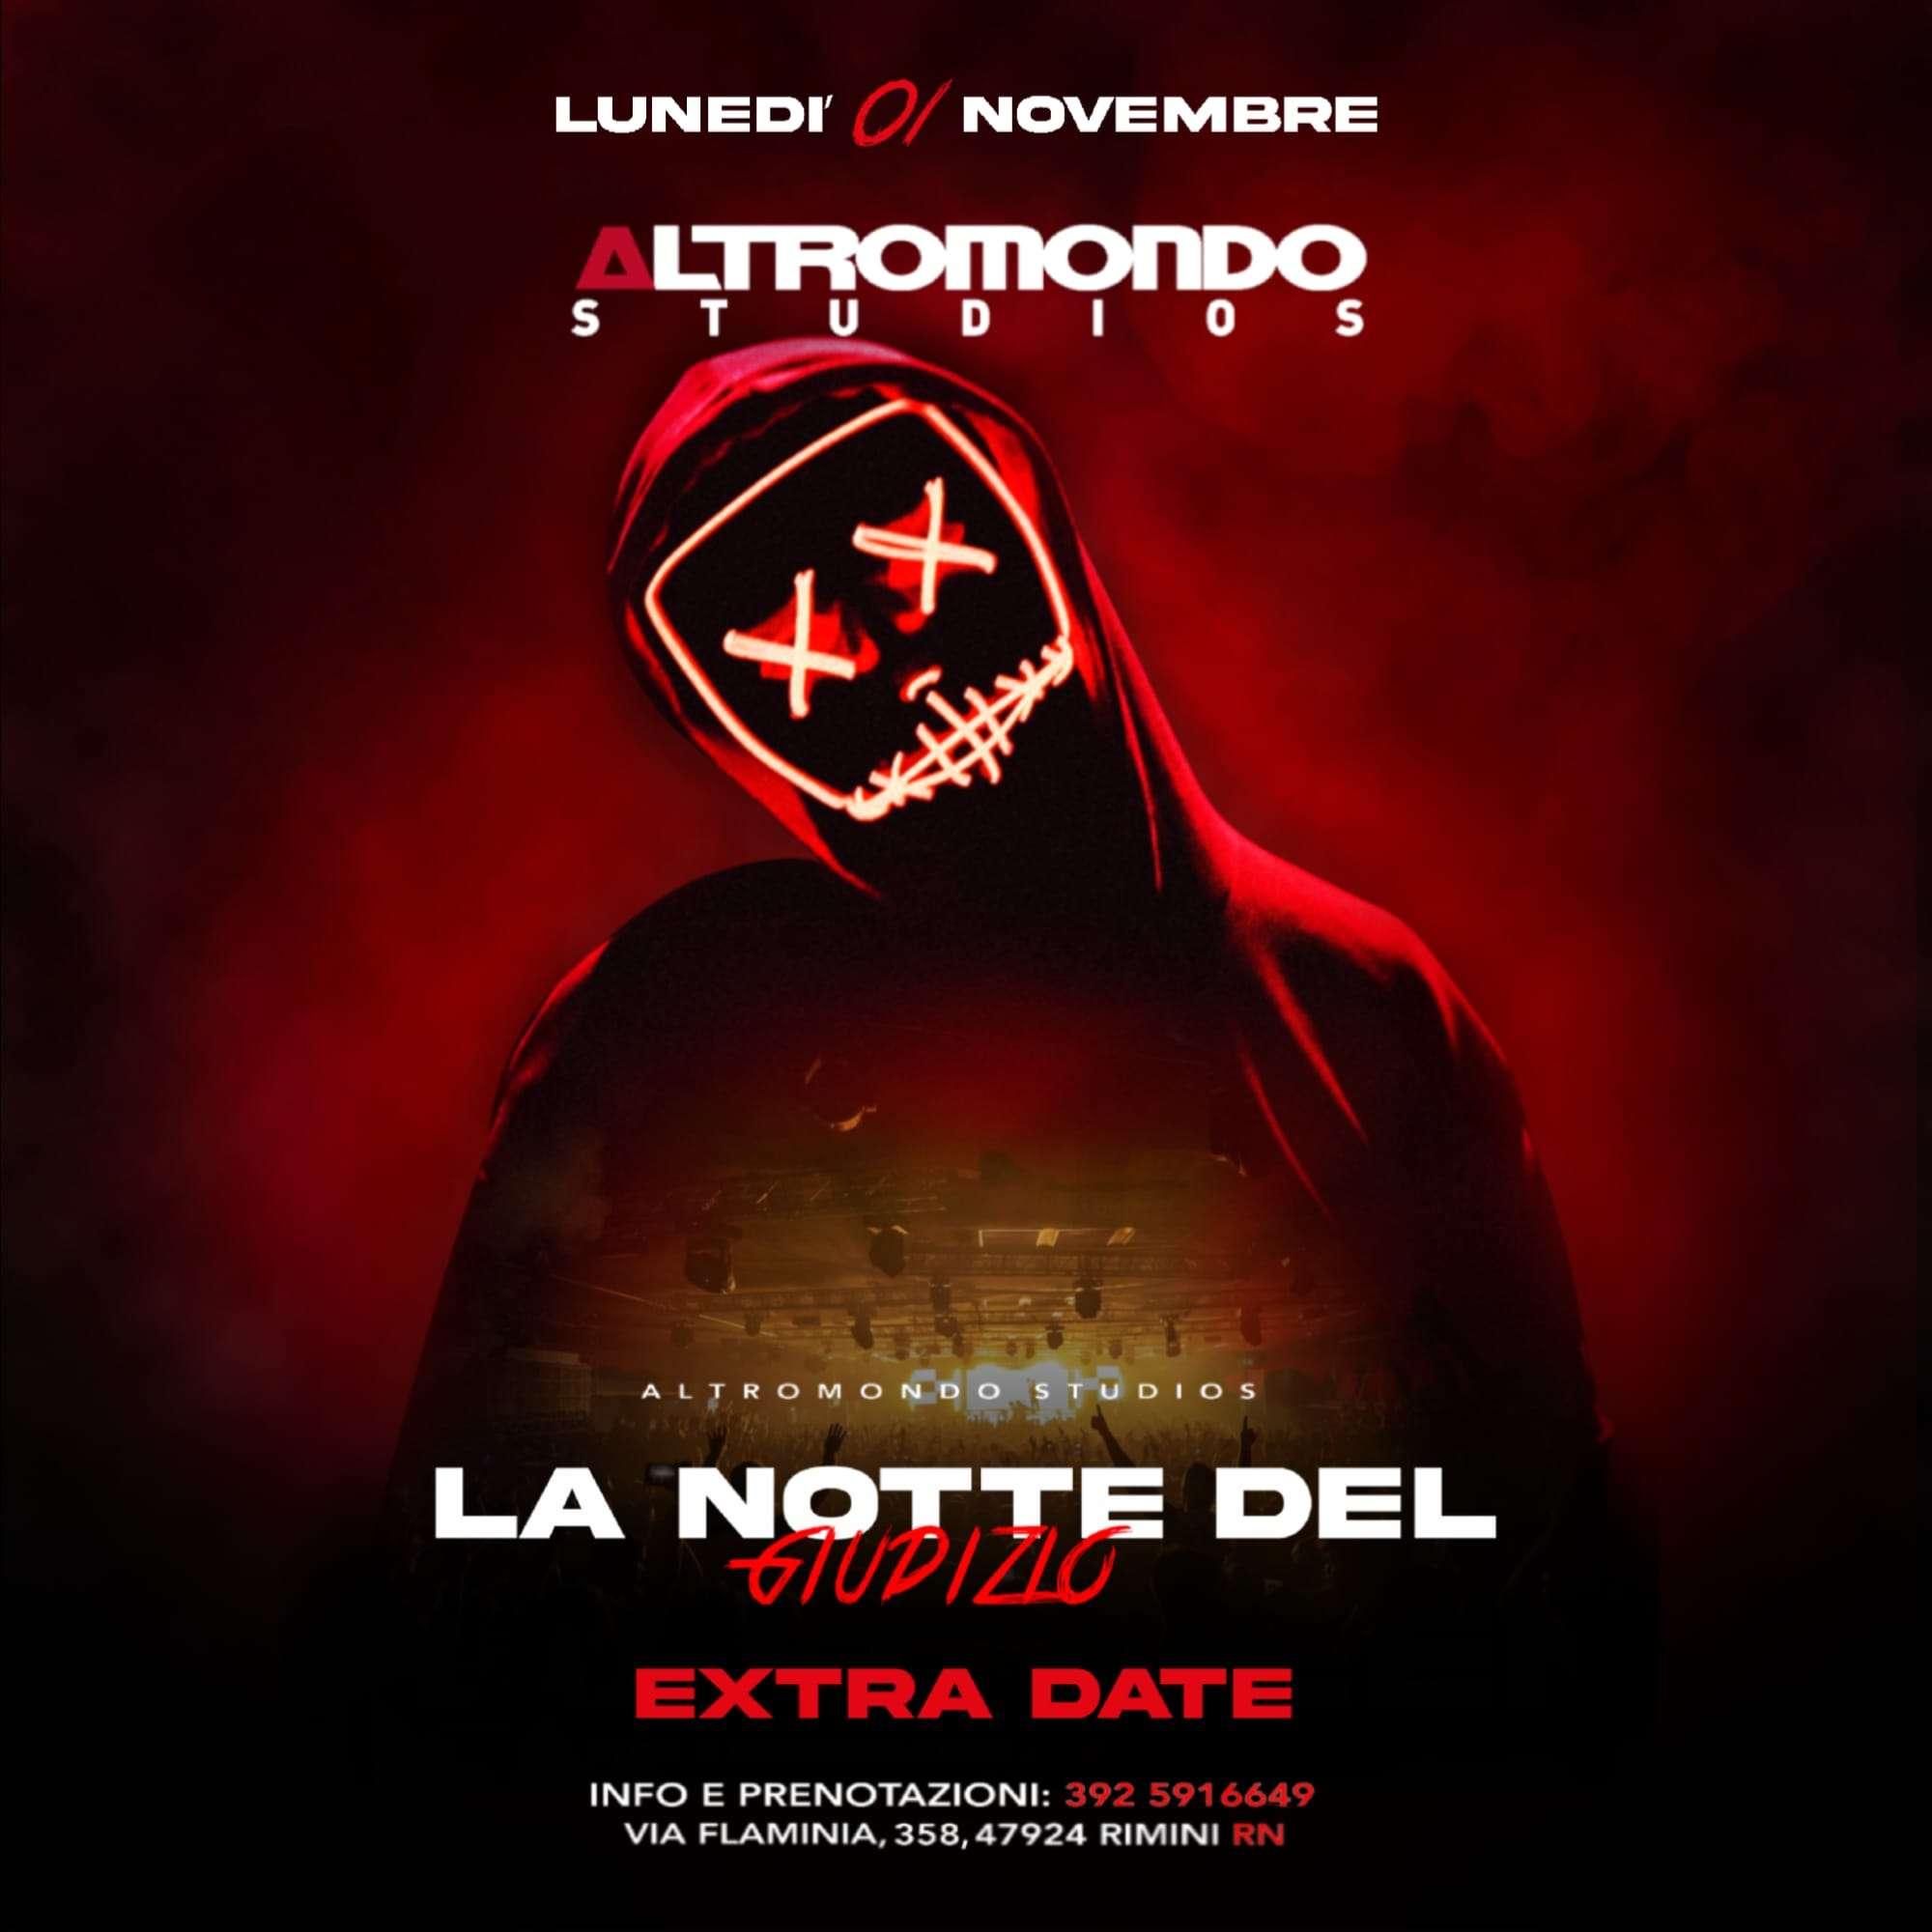 01/11 EXTRA DATE ALTROMONDO STUDIOS Altromondo Studios / RN